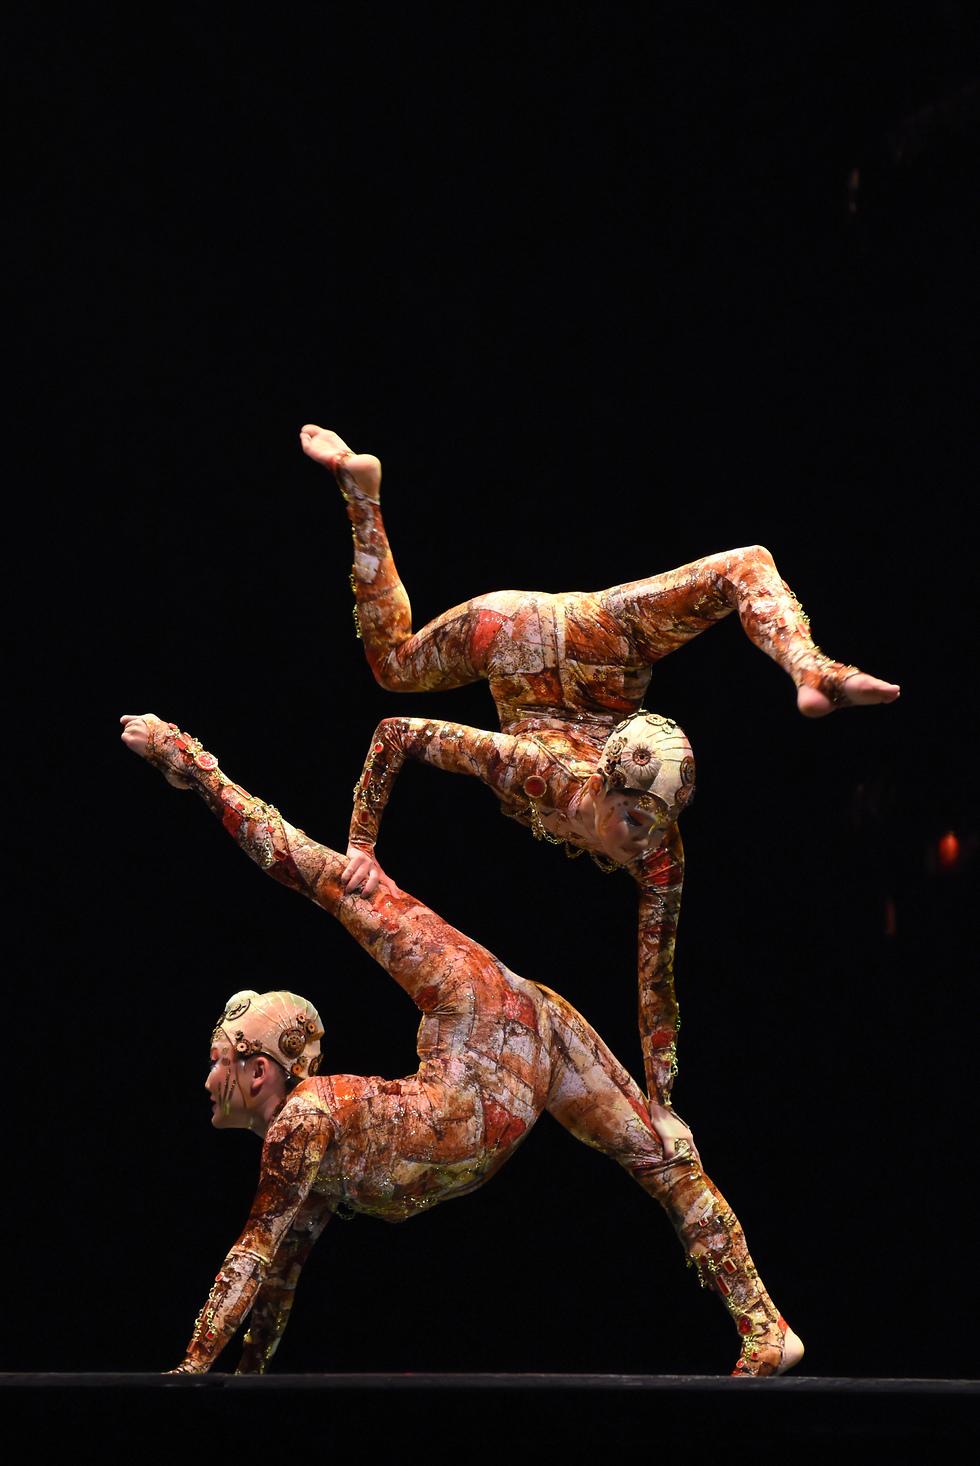 סירק דה סוליי (צילום: Annika Franco Costumes: Marie-Chantale Vaillancourt  © 2015 Cirque du Soleil)